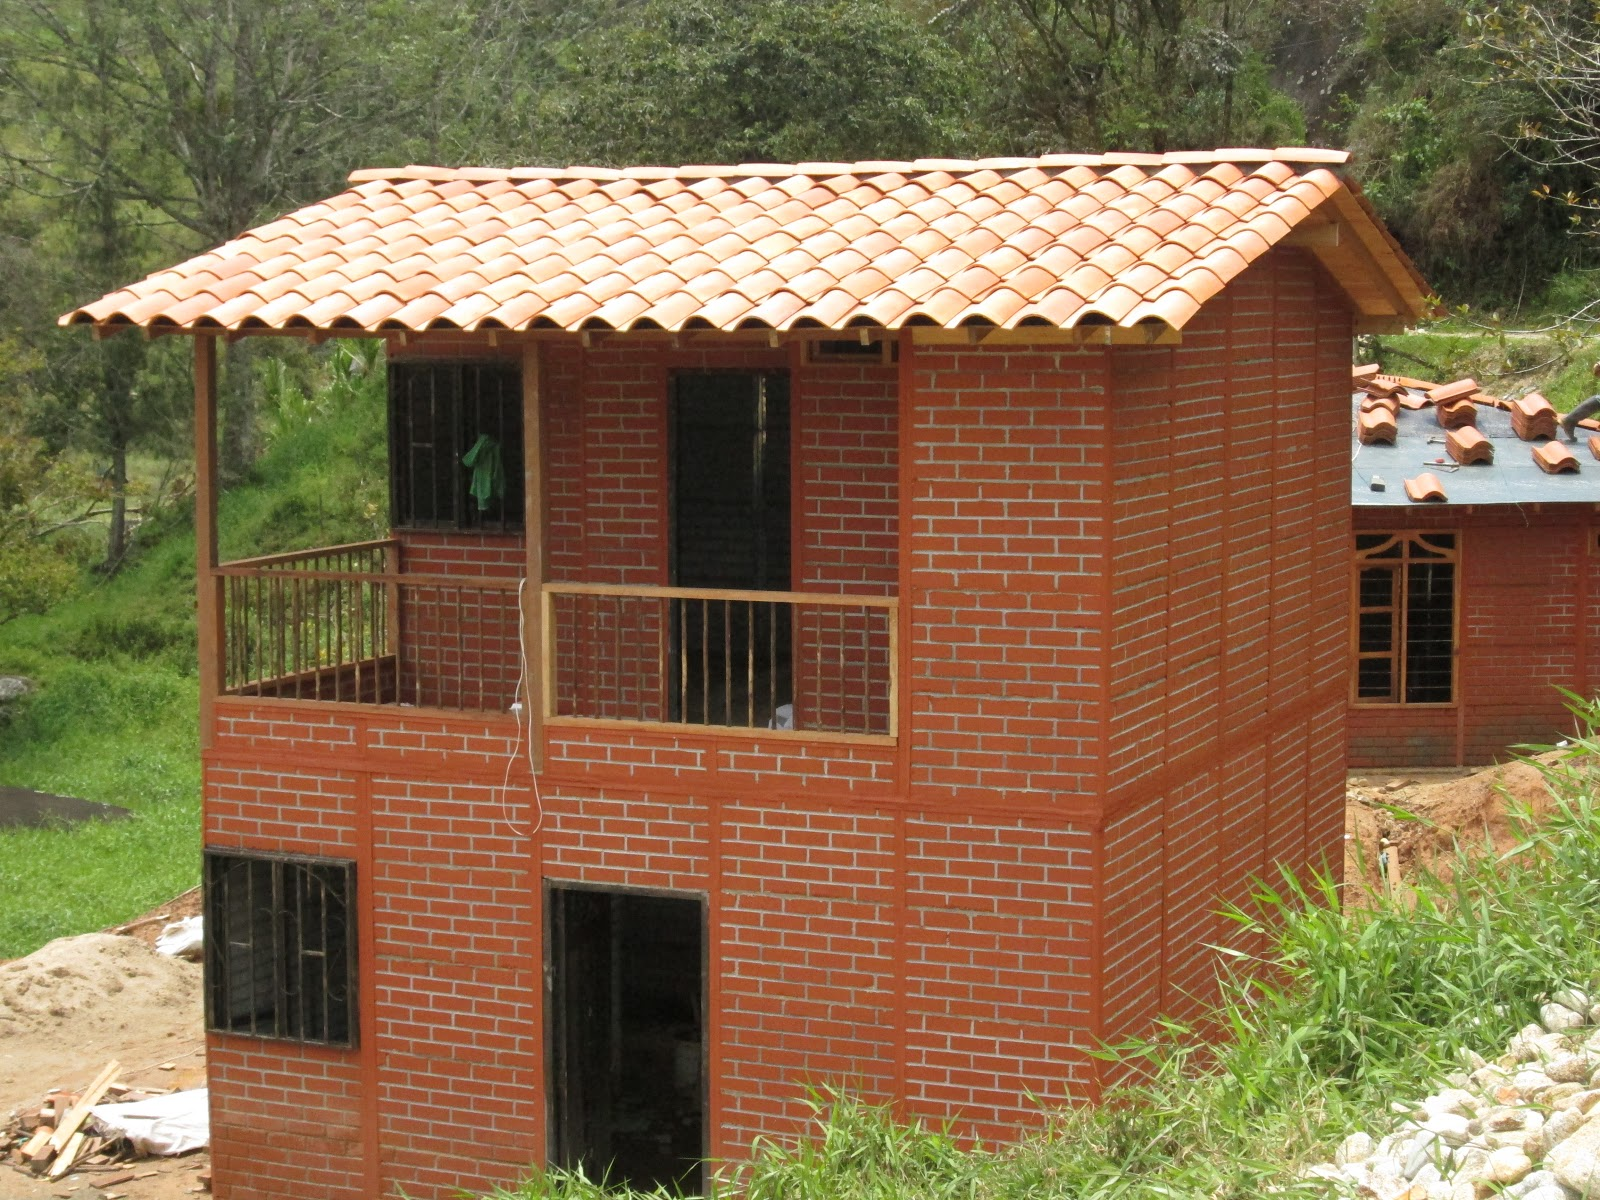 Casas prefabricadas casa real casas de dos niveles - Imagenes casas prefabricadas ...